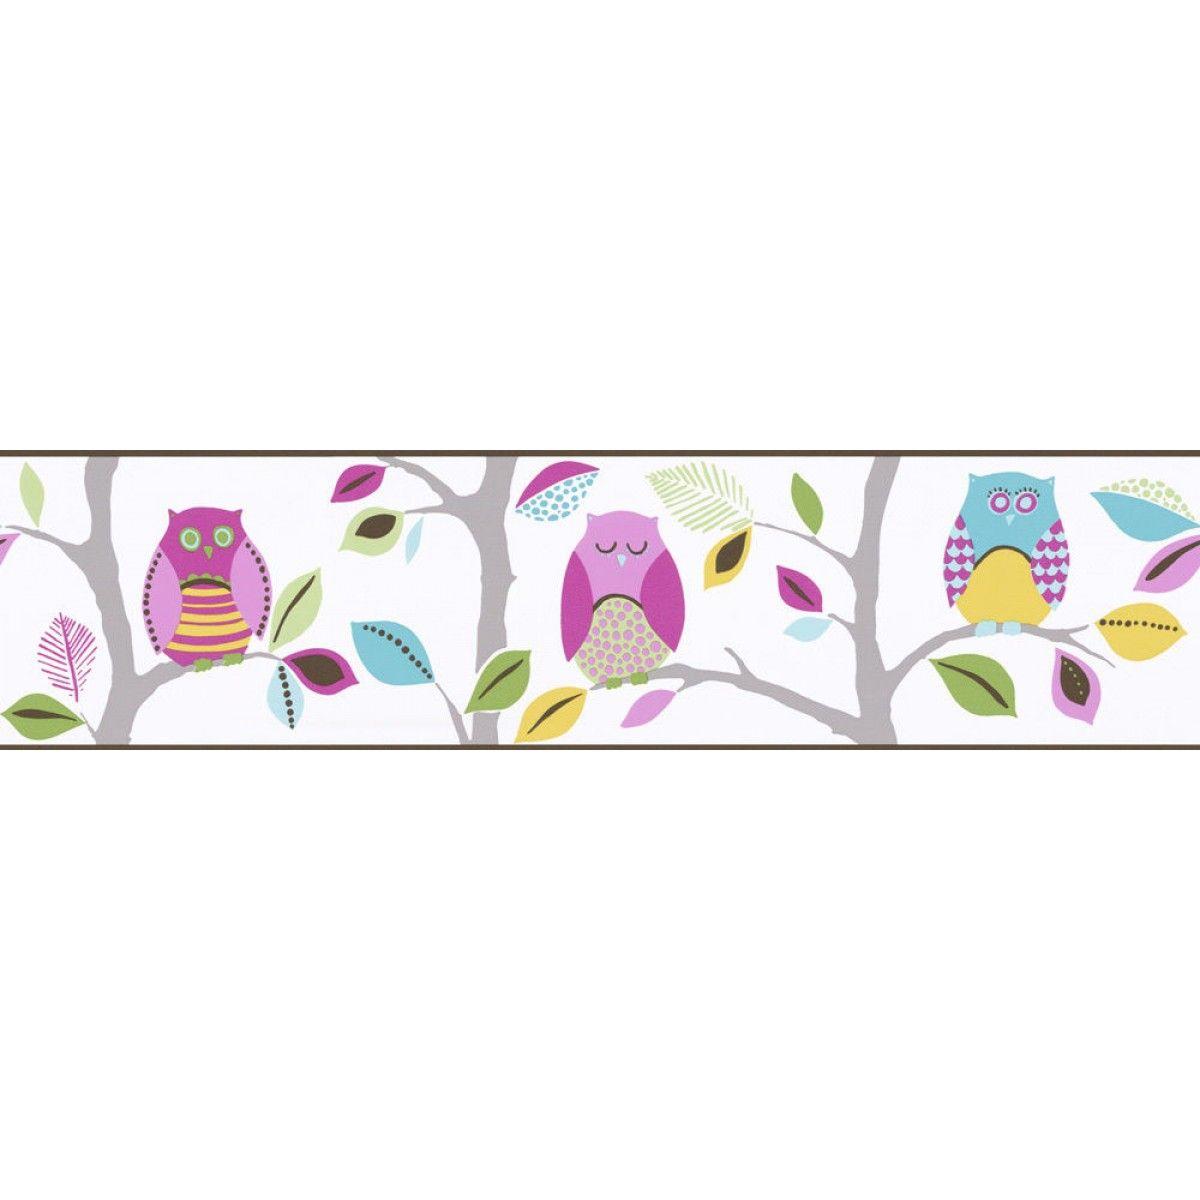 Bright Owls Self Adhesive Wallpaper Border Self Adhesive Wallpaper Self Adhesive Wallpaper Borders Wallpaper Border